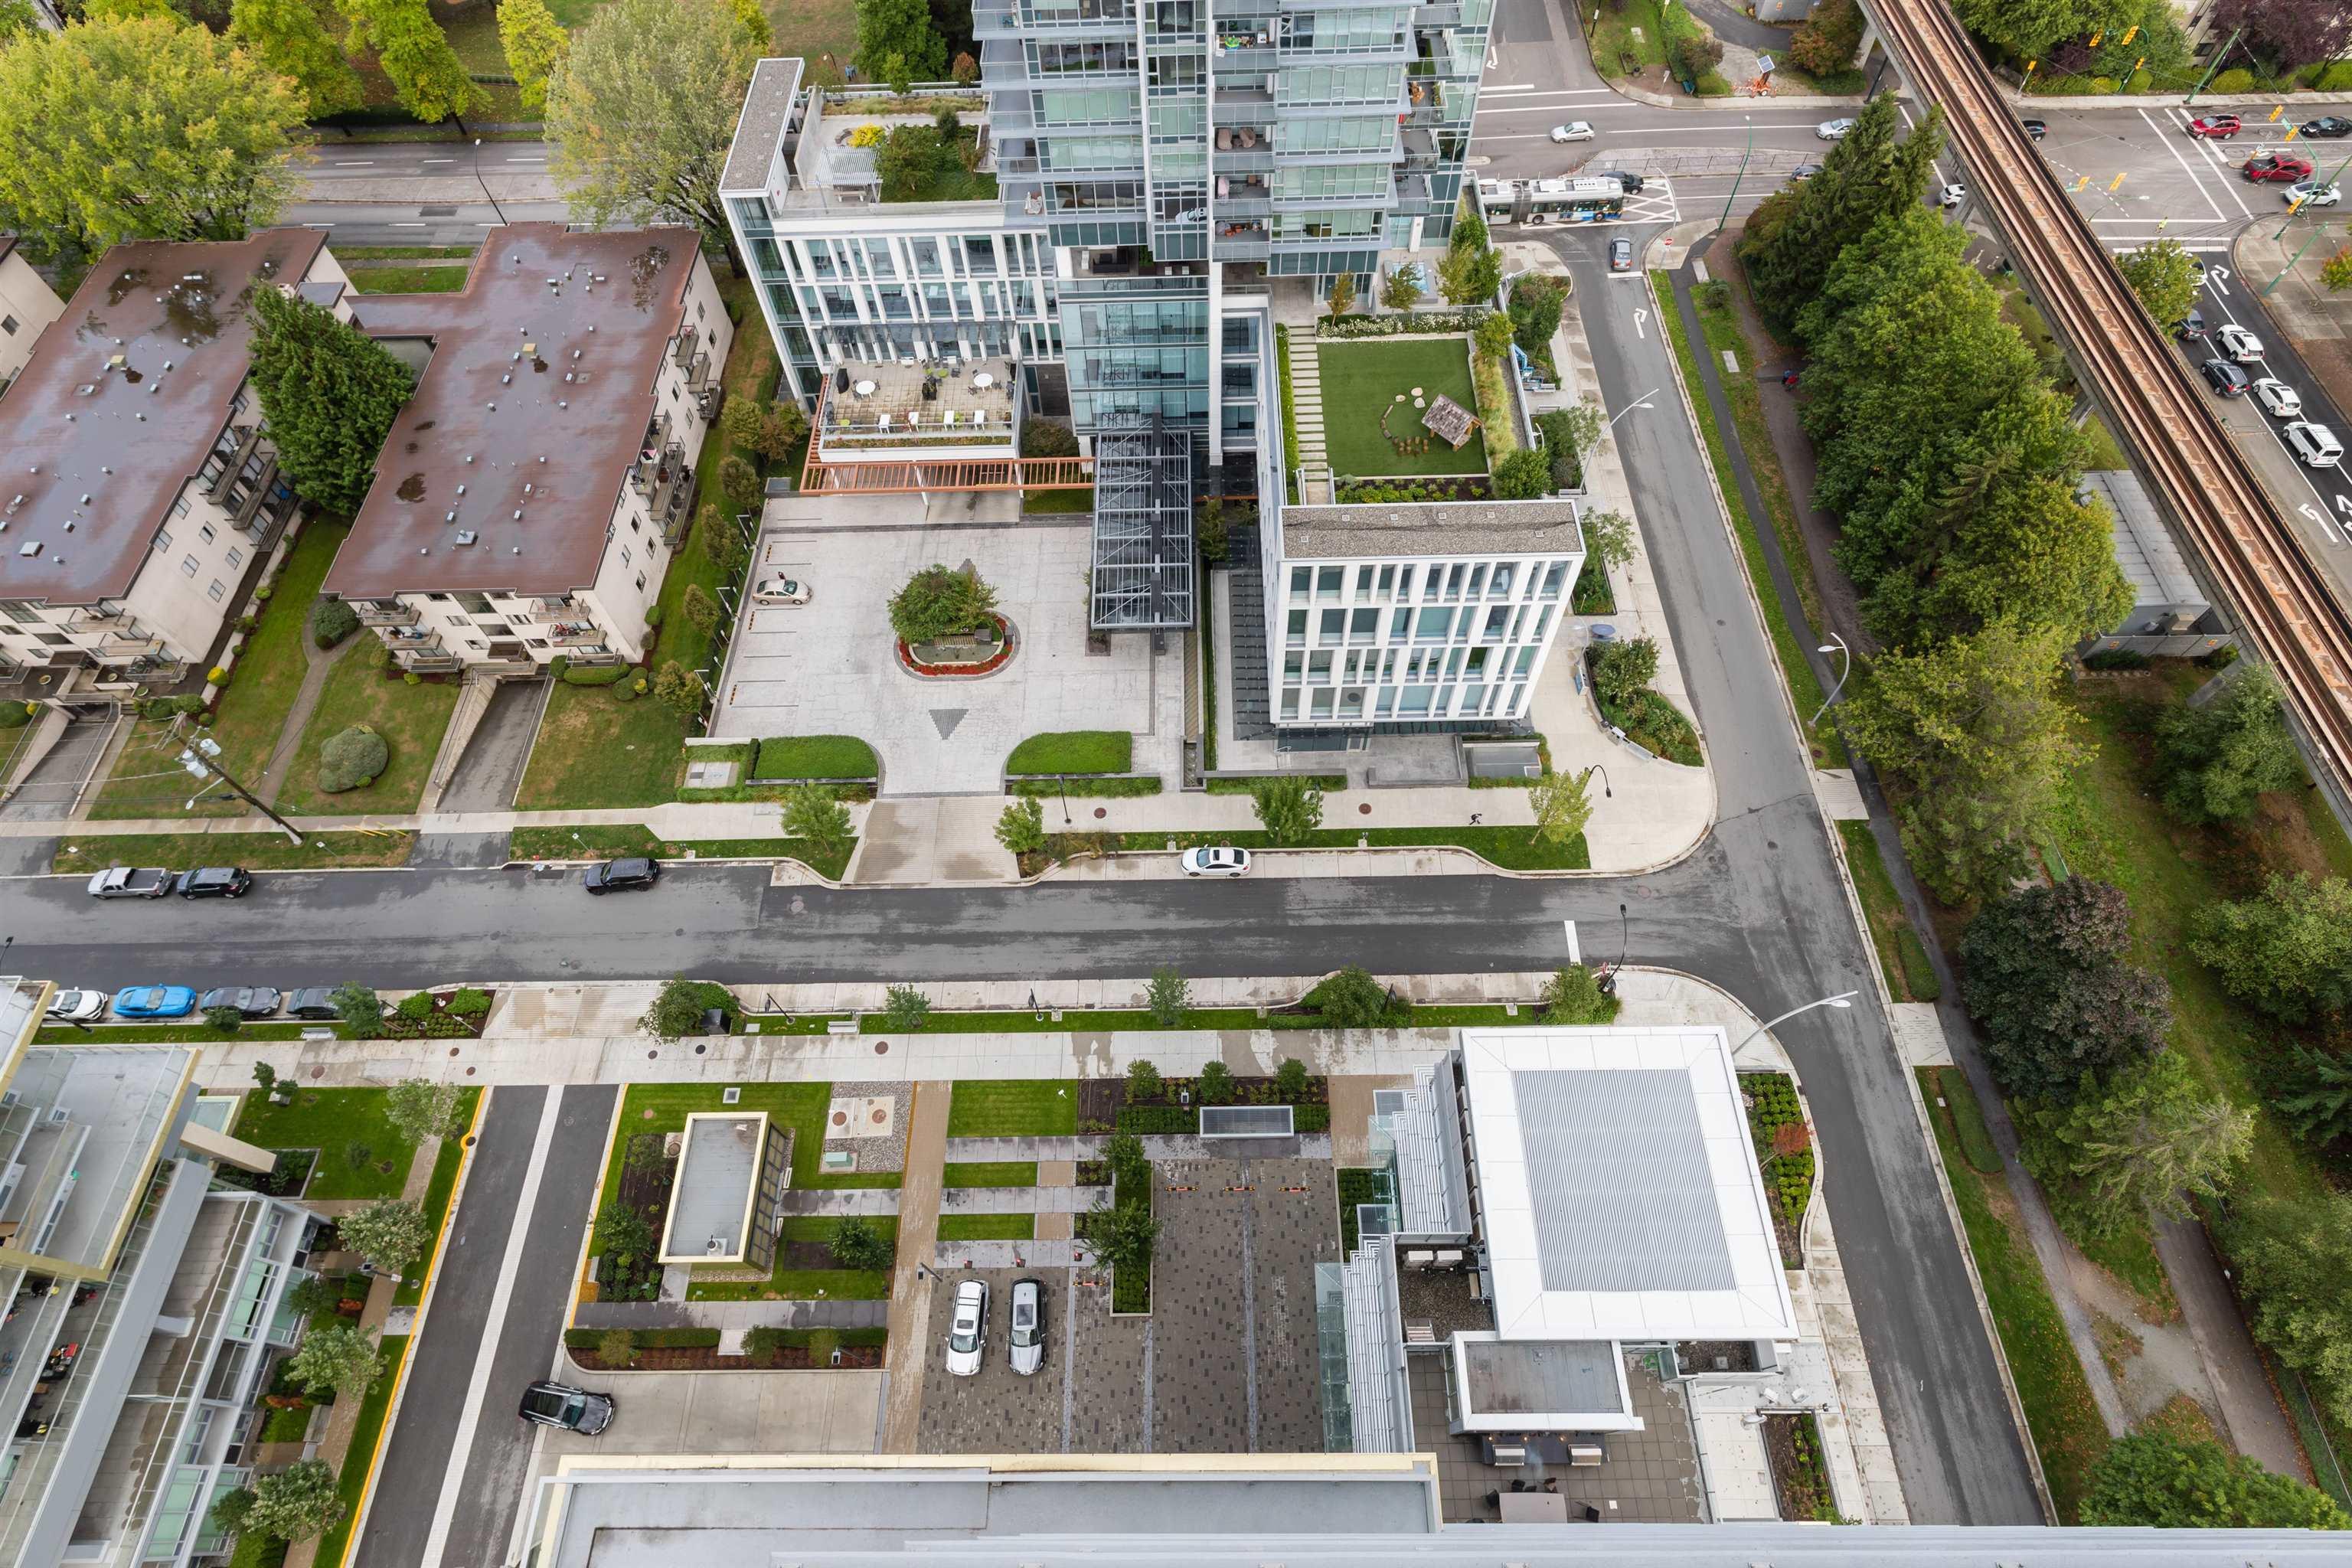 2206 6383 MCKAY AVENUE - Metrotown Apartment/Condo for sale, 2 Bedrooms (R2625647) - #26